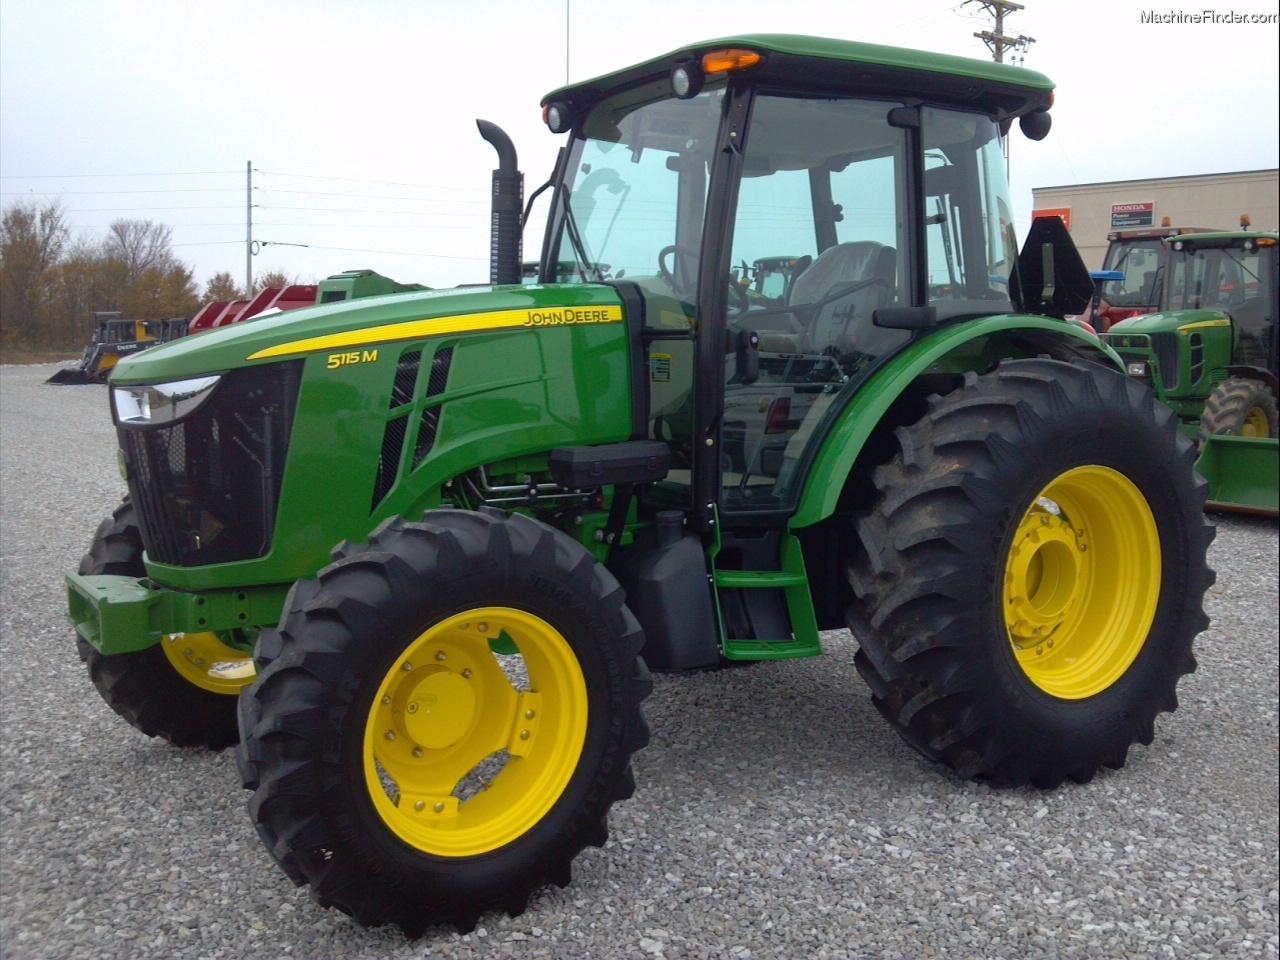 2014 John Deere 5115m Tractors Utility 40 100hp John